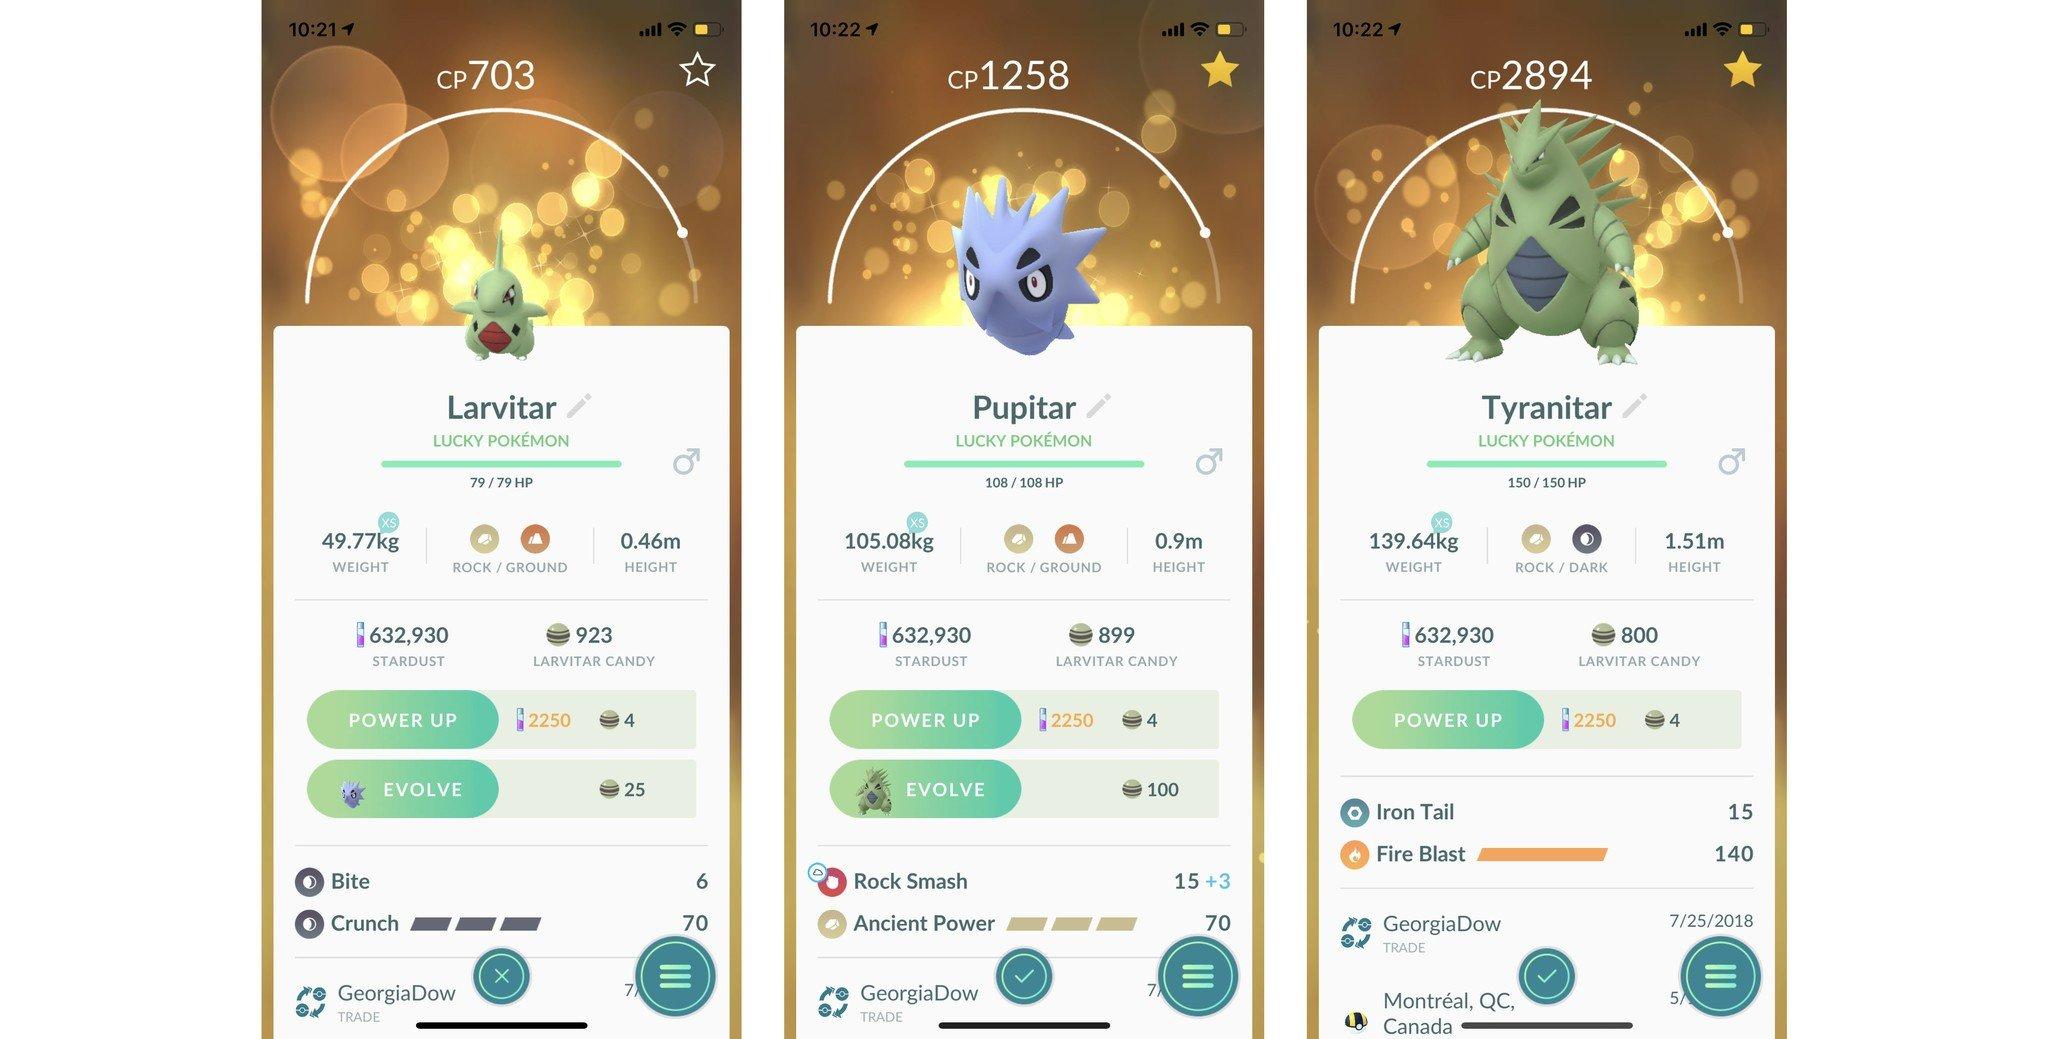 Best Pokémon Go Tips And Tricks For June 2019